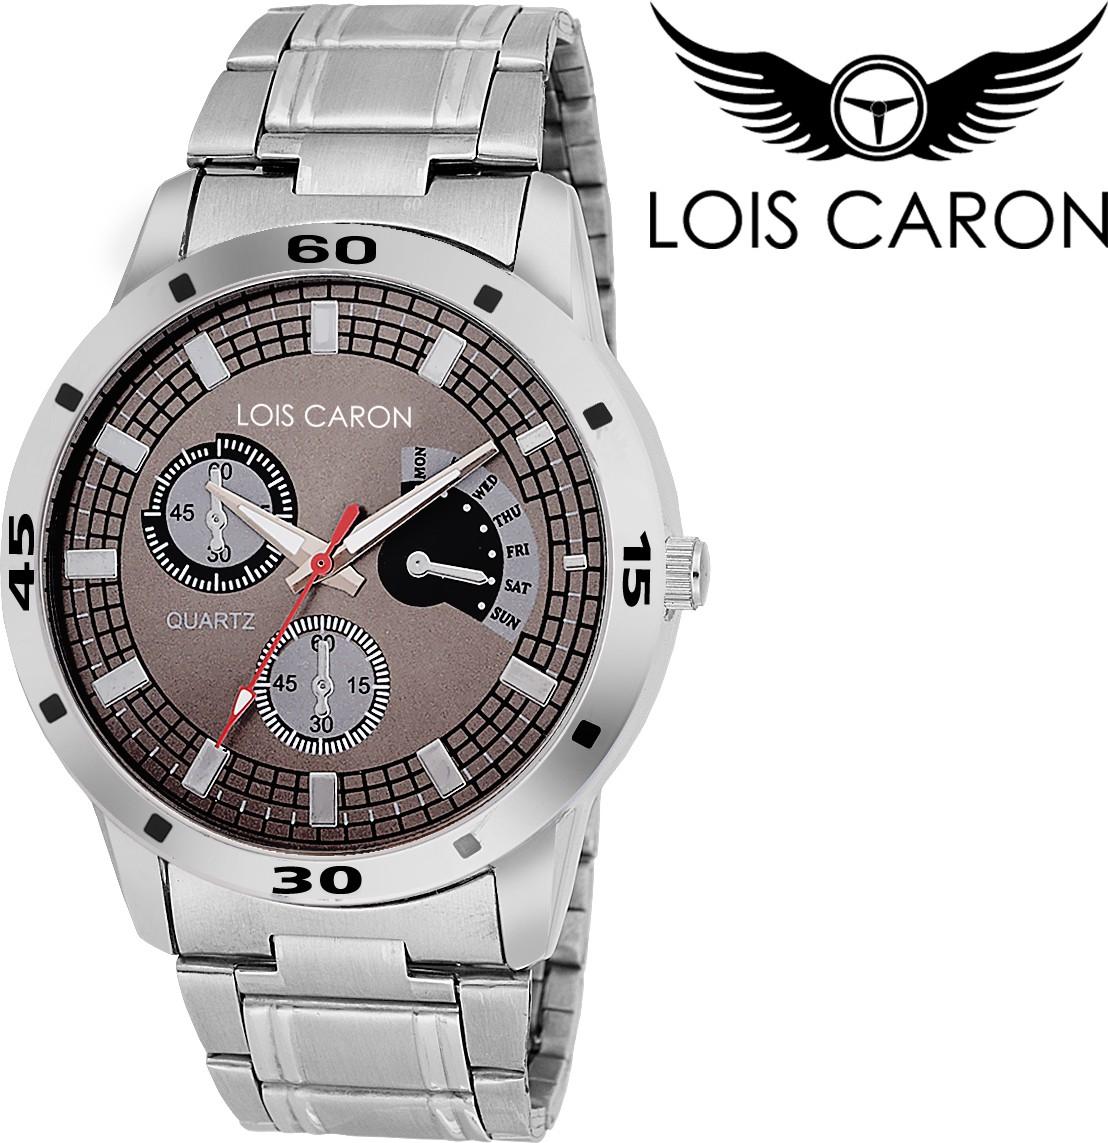 Deals - Delhi - Lois Caron & more <br> Watches<br> Category - watches<br> Business - Flipkart.com